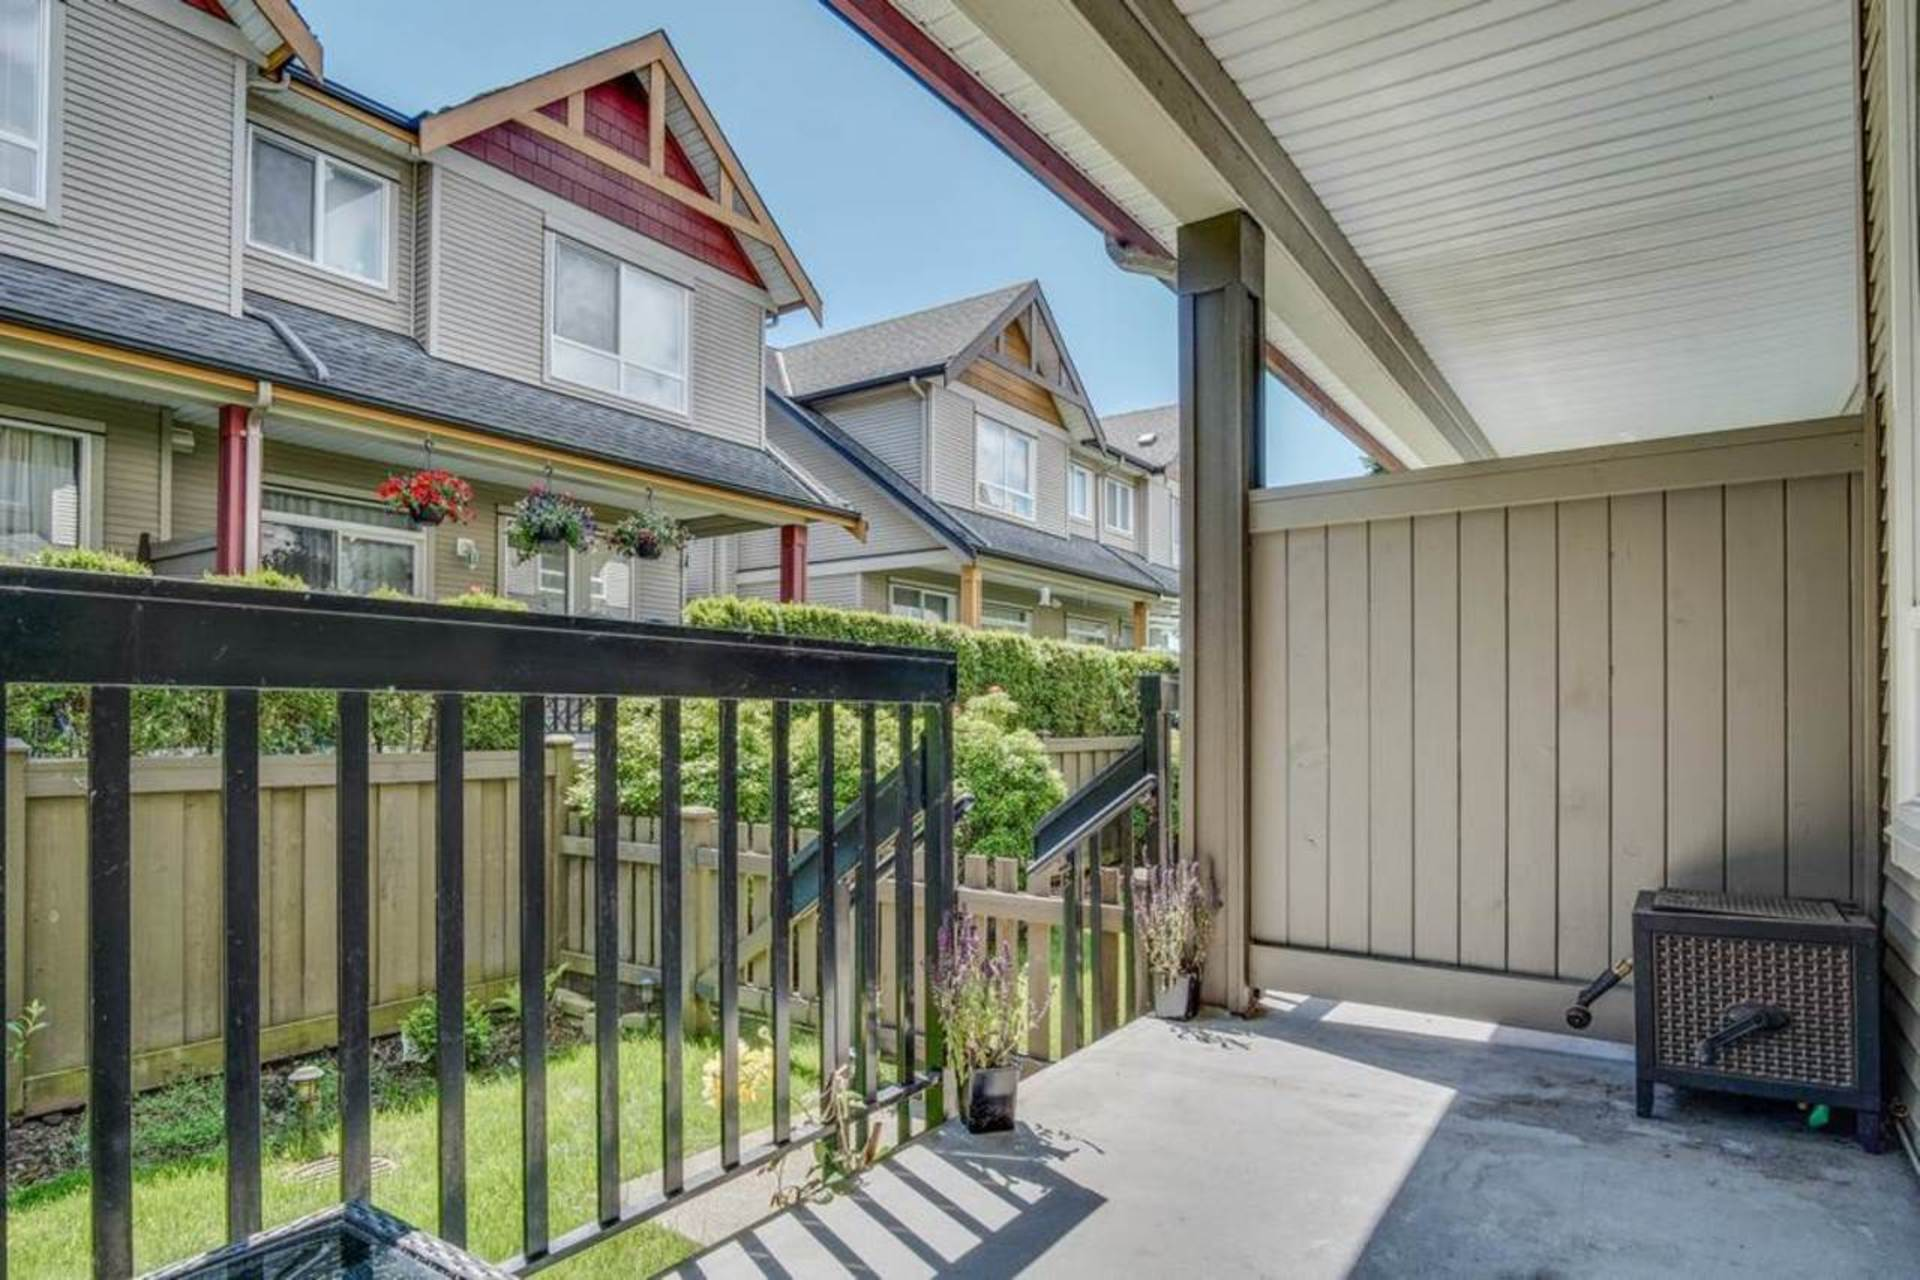 16789-60-avenue-cloverdale-bc-cloverdale-12 at 20 - 16789 60 Avenue, Cloverdale BC, Cloverdale